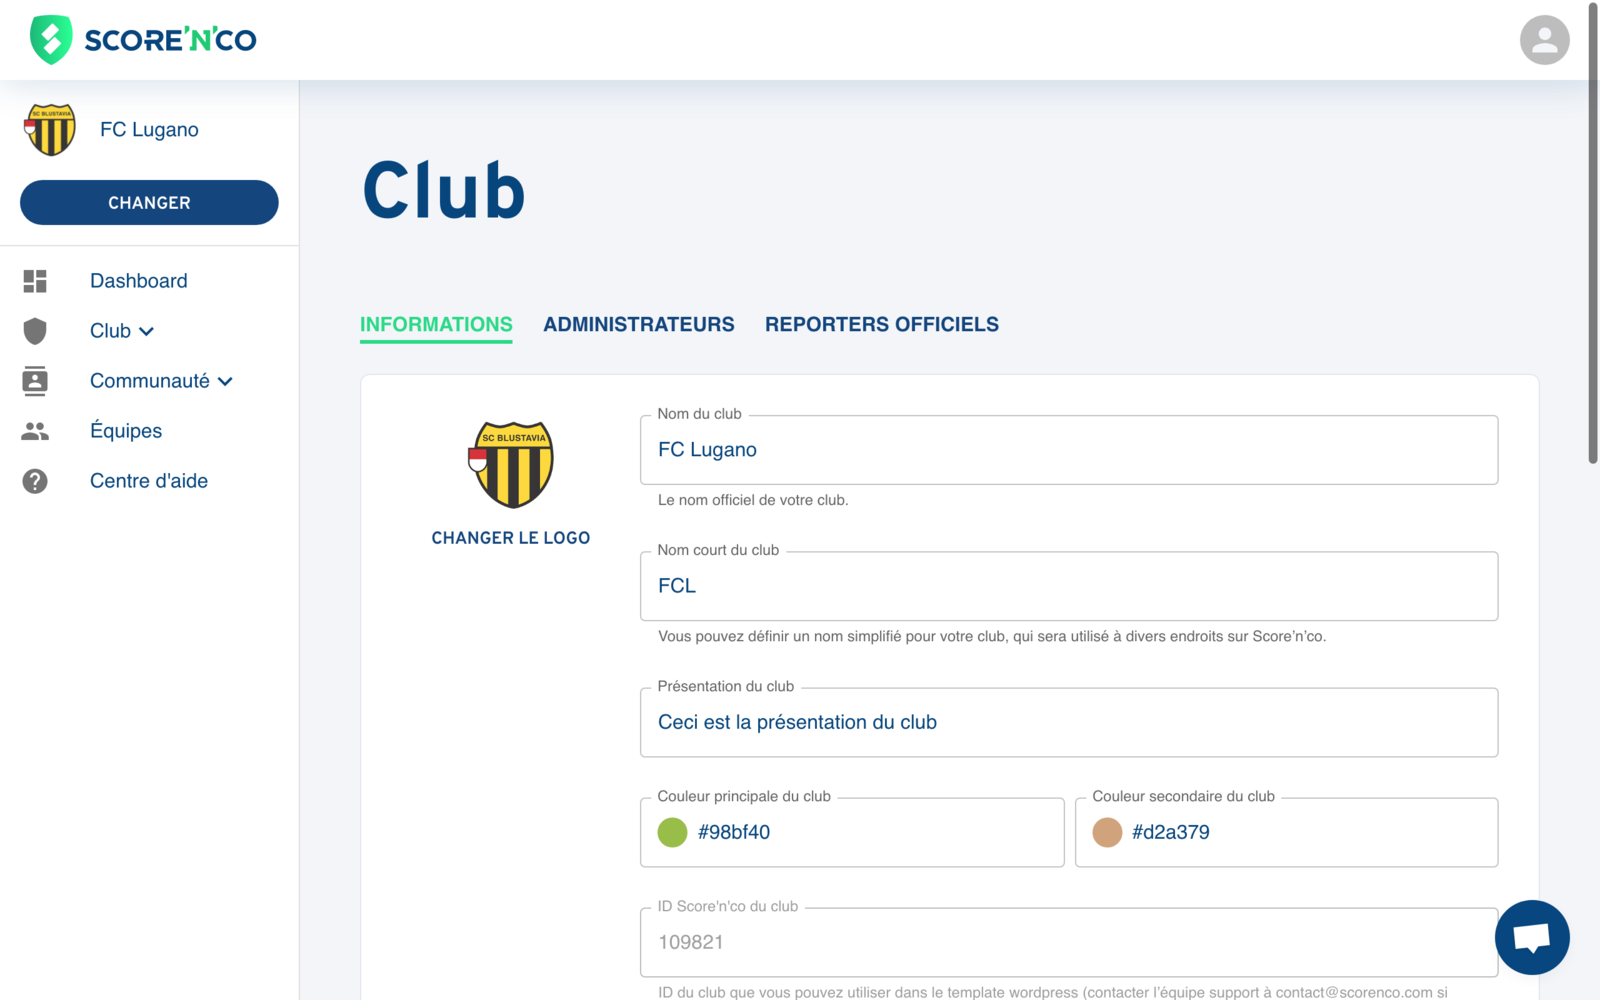 Rubrique Club - Onglet Informations - Score'n'co